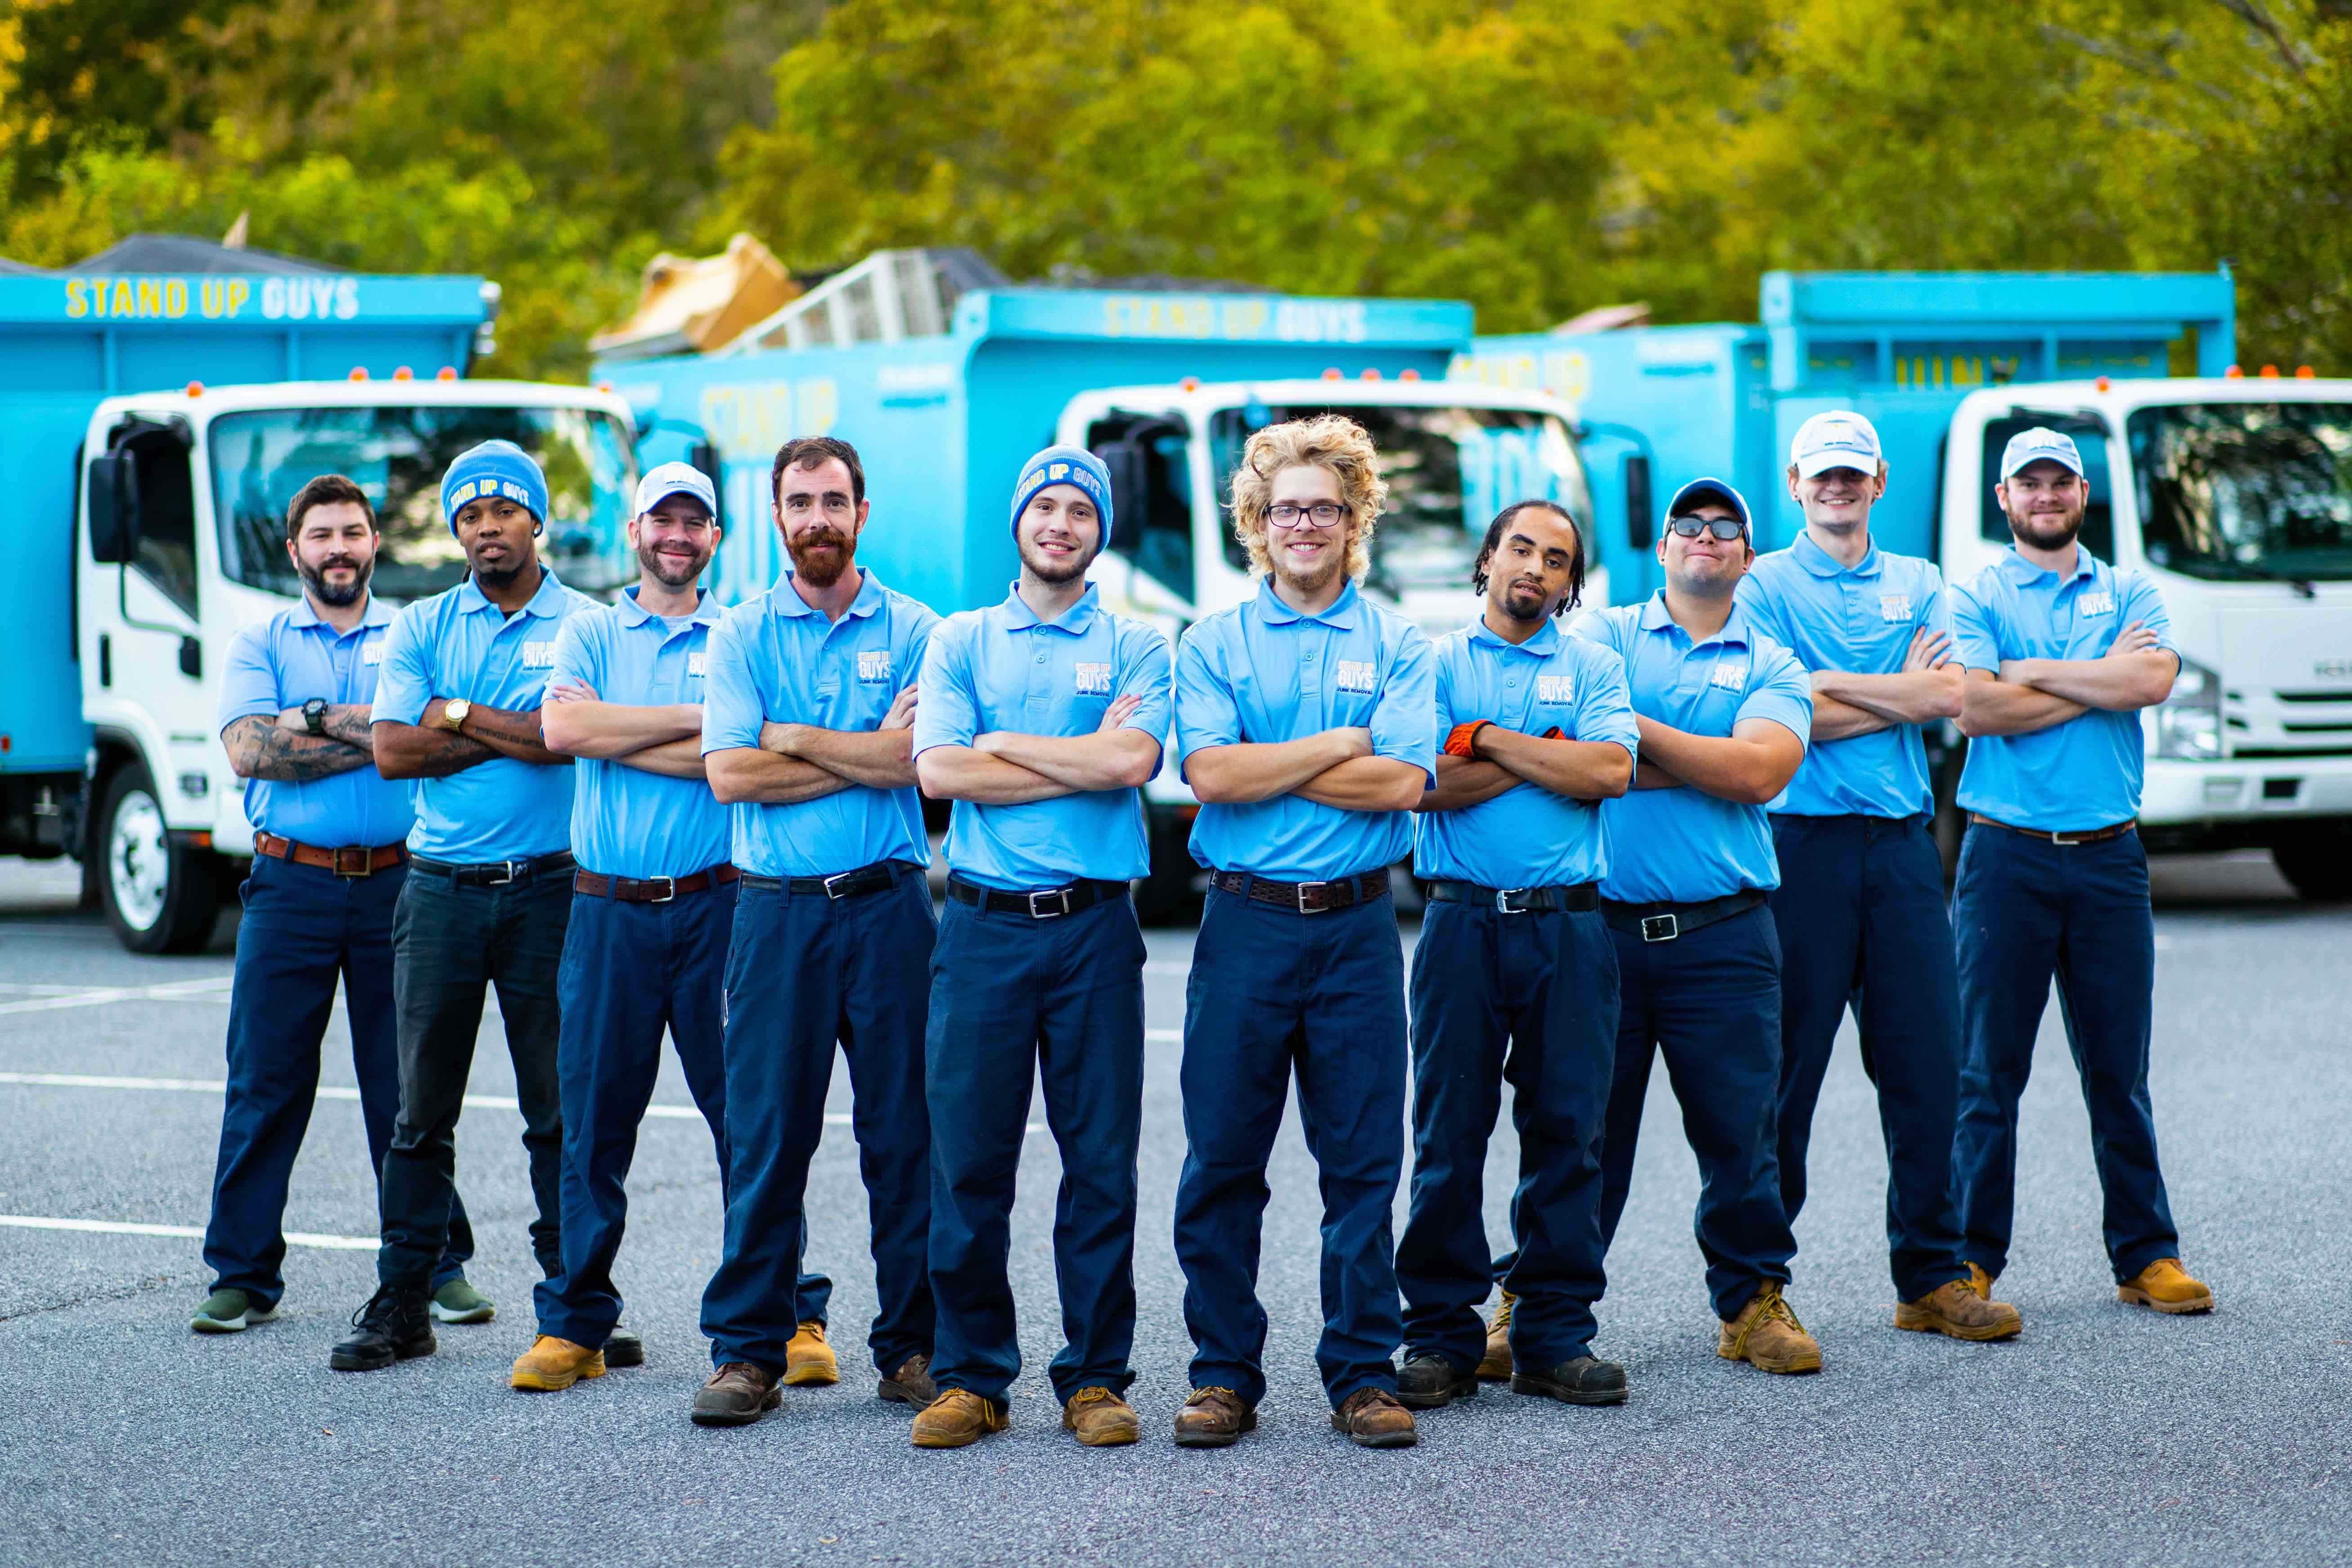 junk removal men in Belmont, NC standing in front of trucks